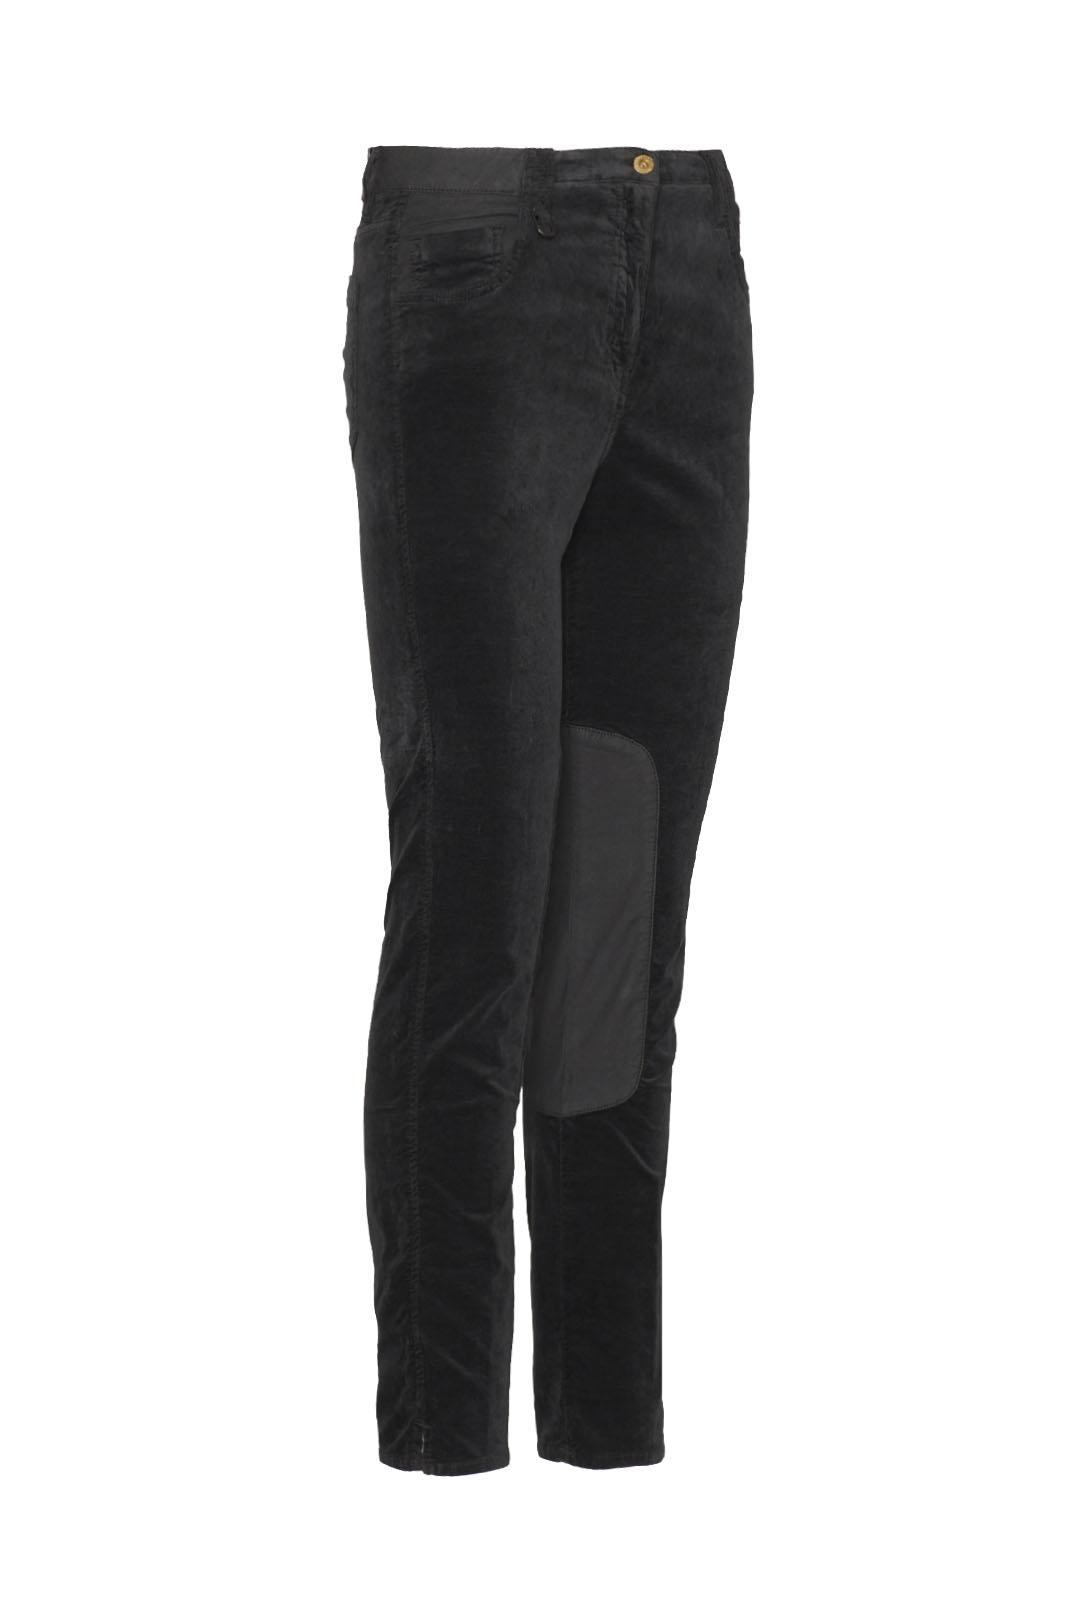 5-pockets velvet trousers with satin     3